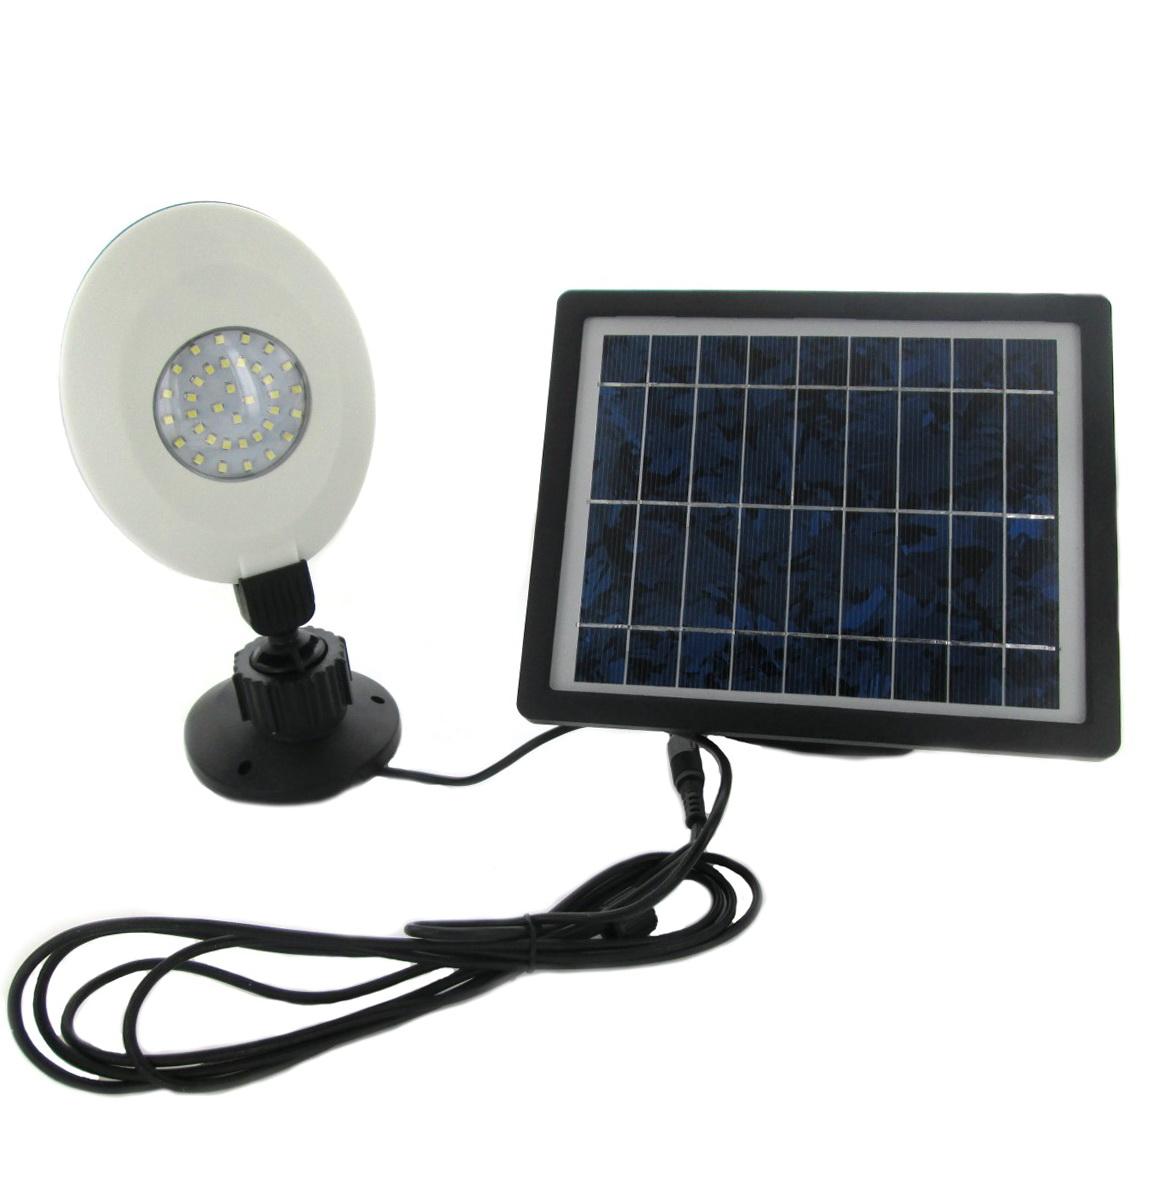 Solar Powered Porch Light With 36 Leds & Motion Sensor